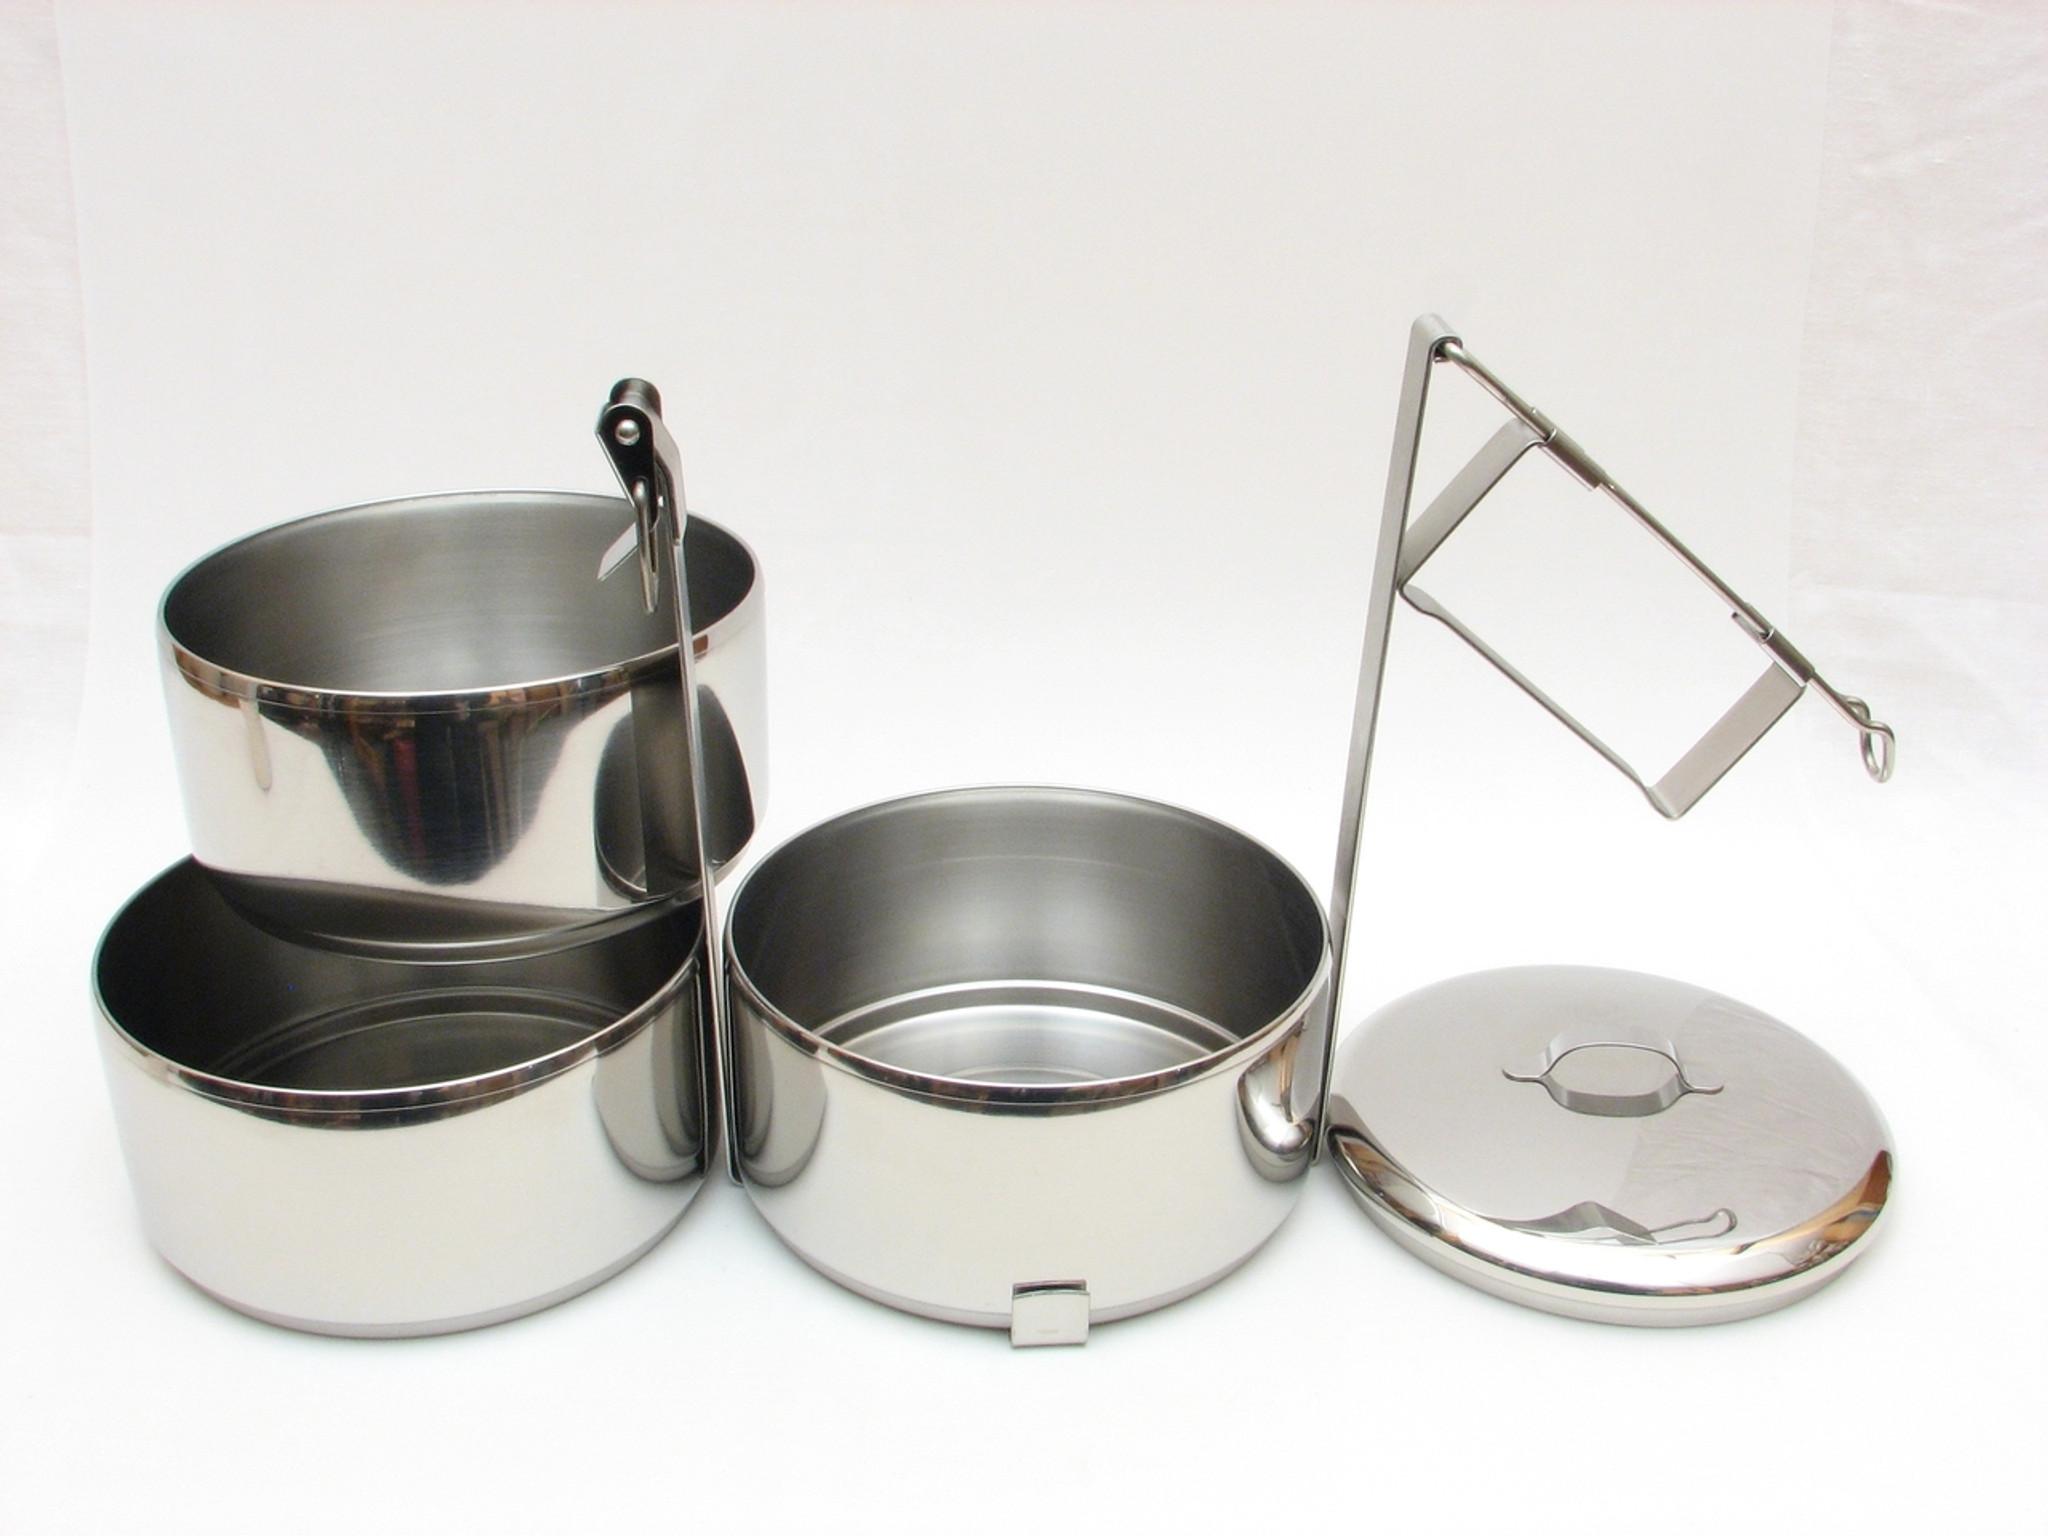 3-Tier Stainless Steel 304 Tiffin, 14 cm / 5 5